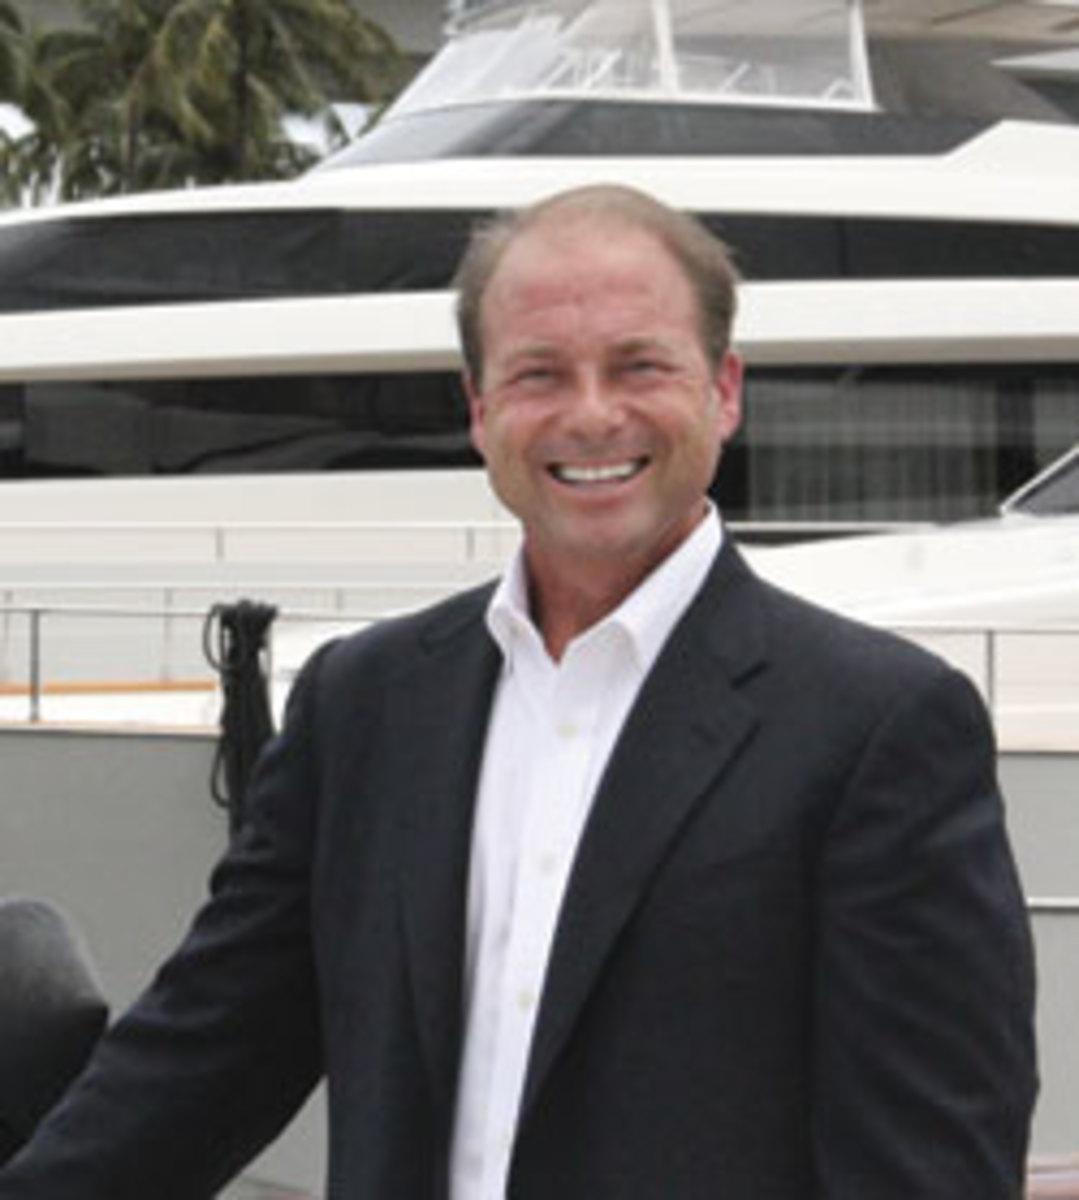 Sanlorenzo Shares director, Philip Burroughs